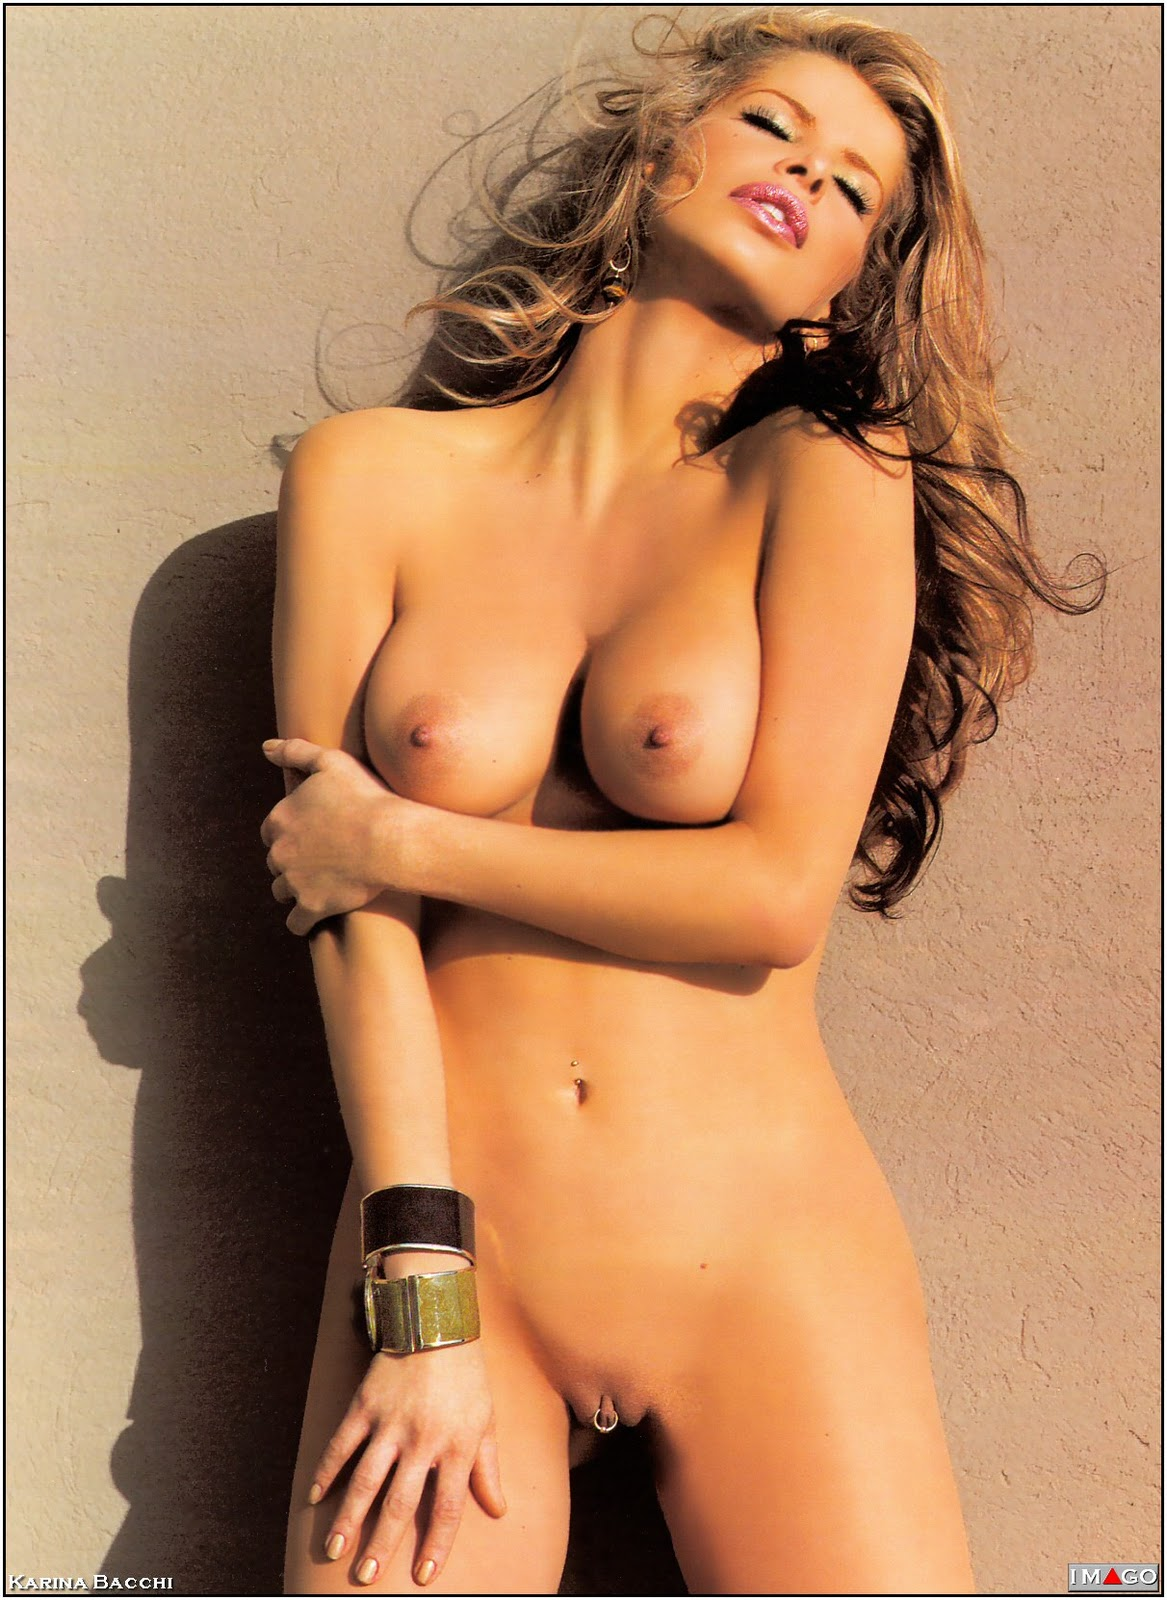 jasmine webcam pornstar jasmine